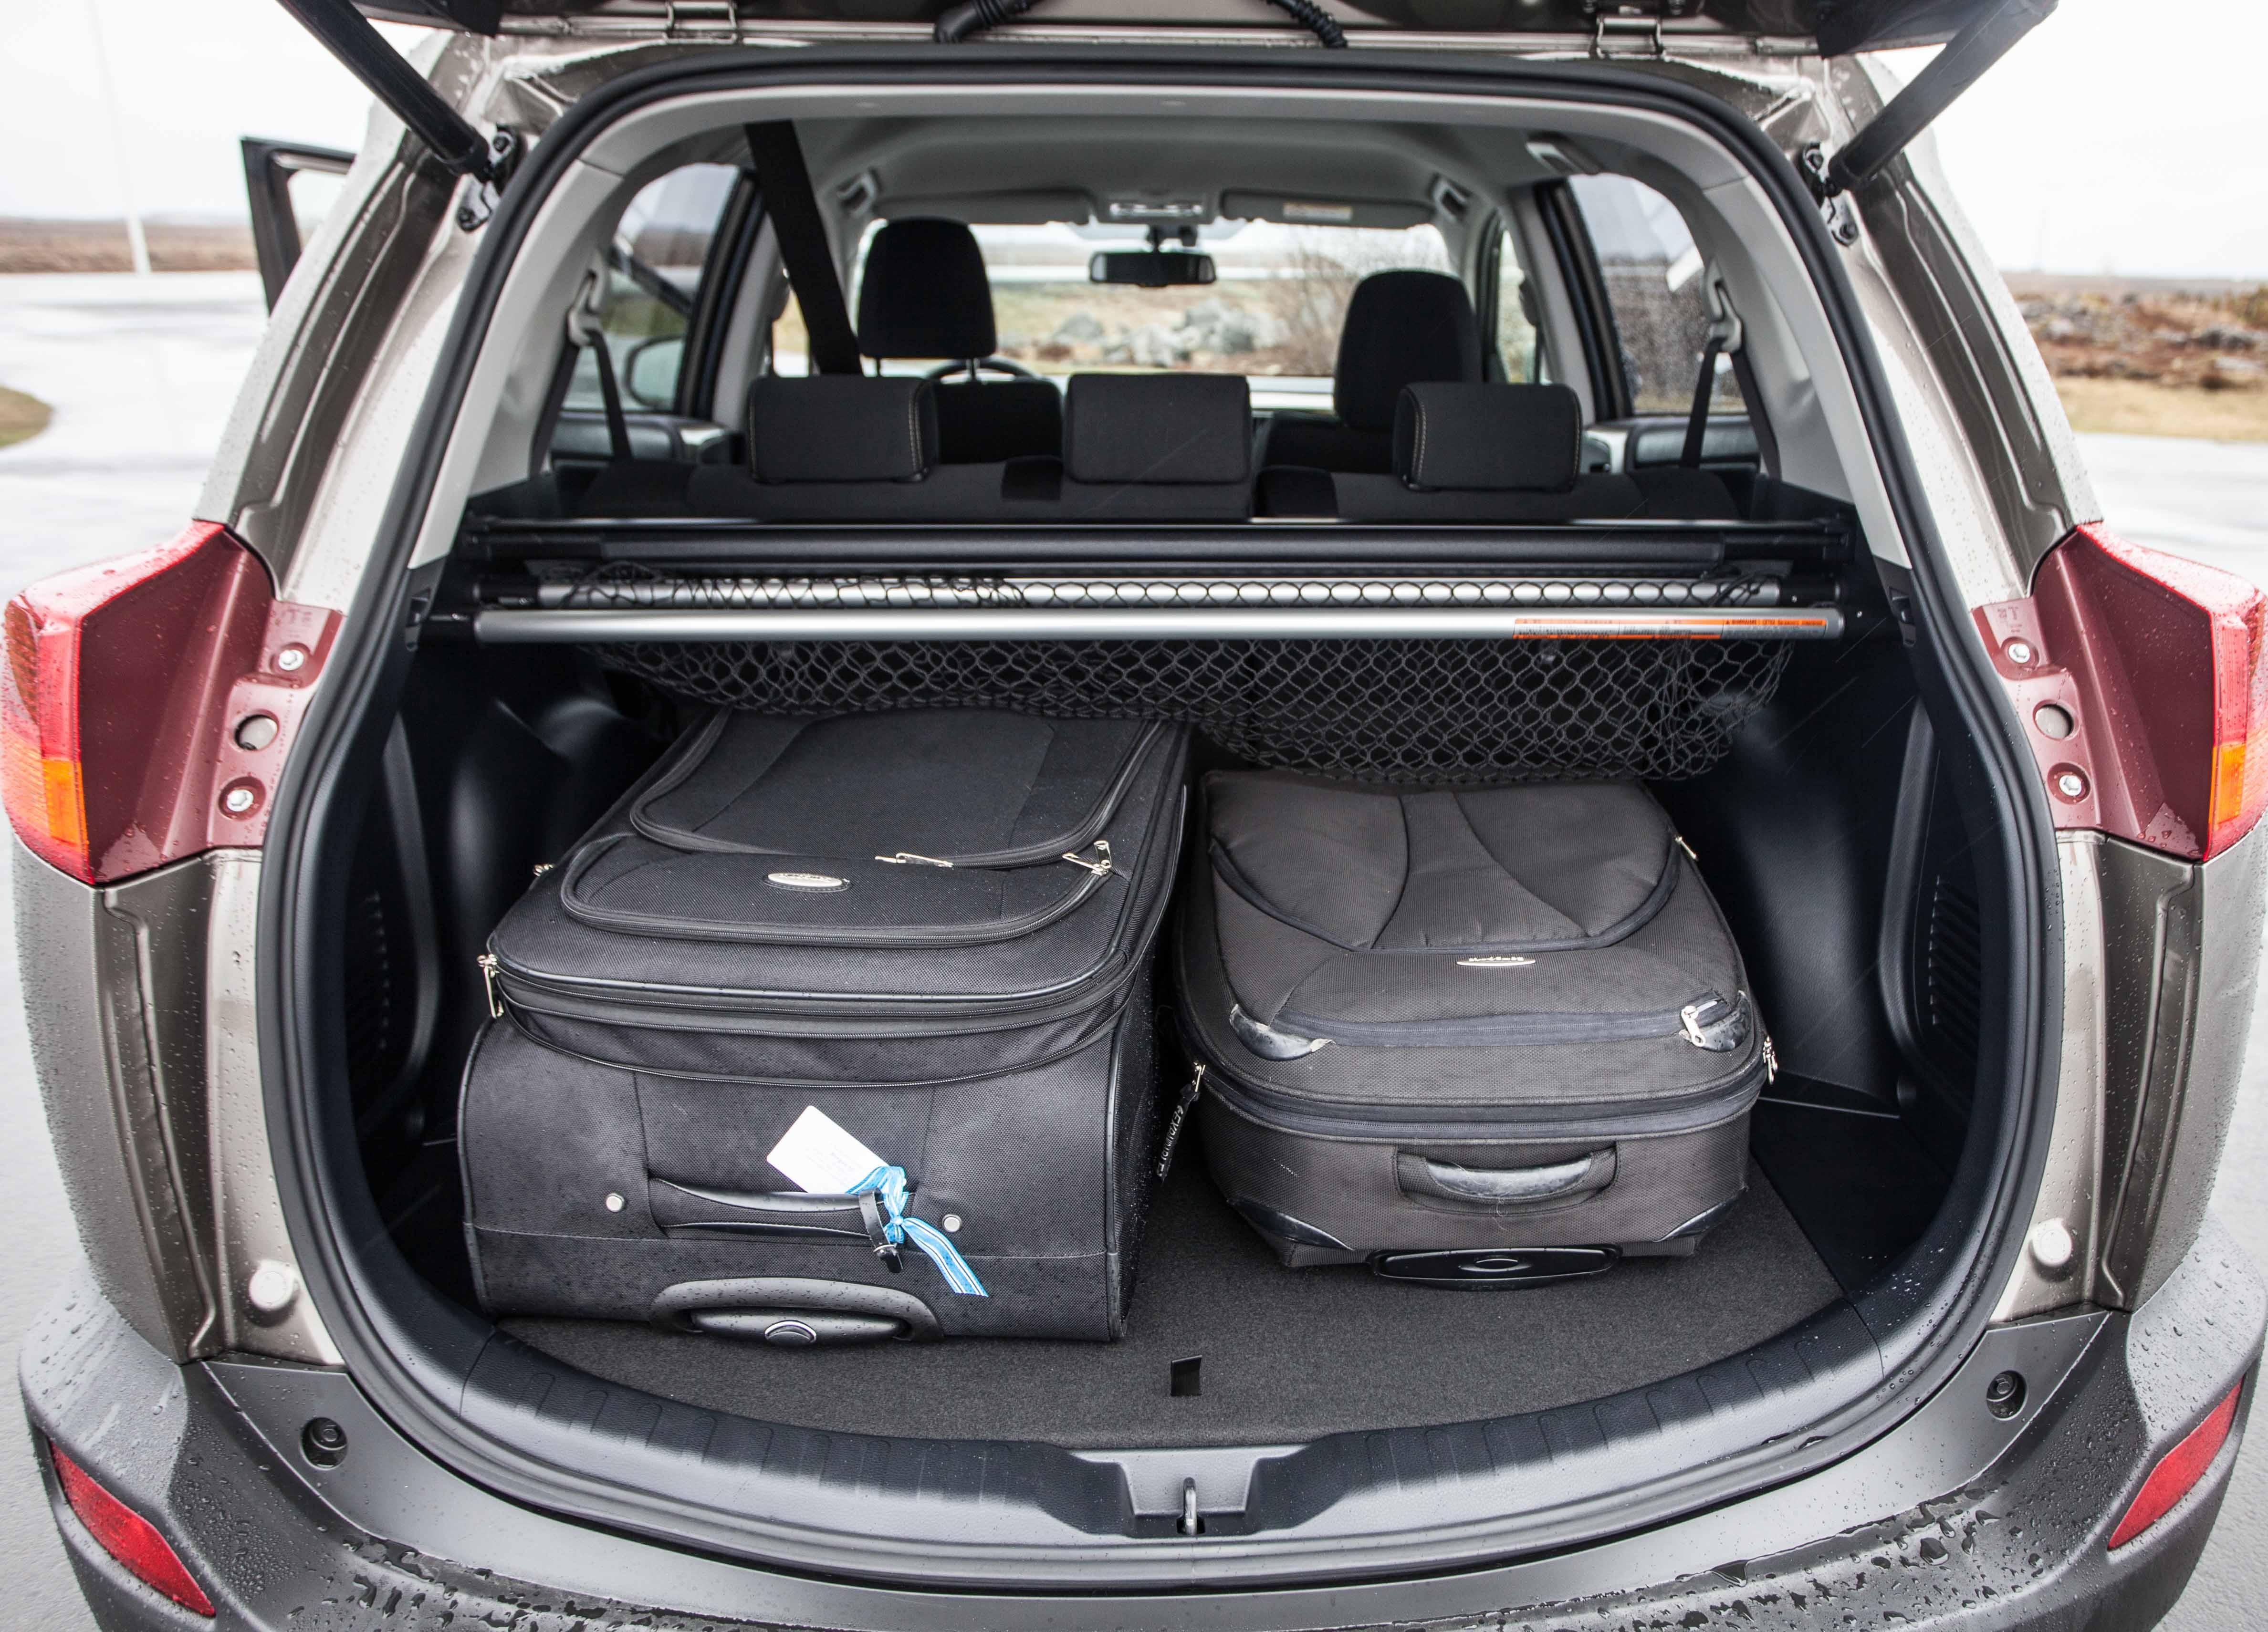 Rental SUV for Icelandic Highlands - Toyota RAV4 4x4